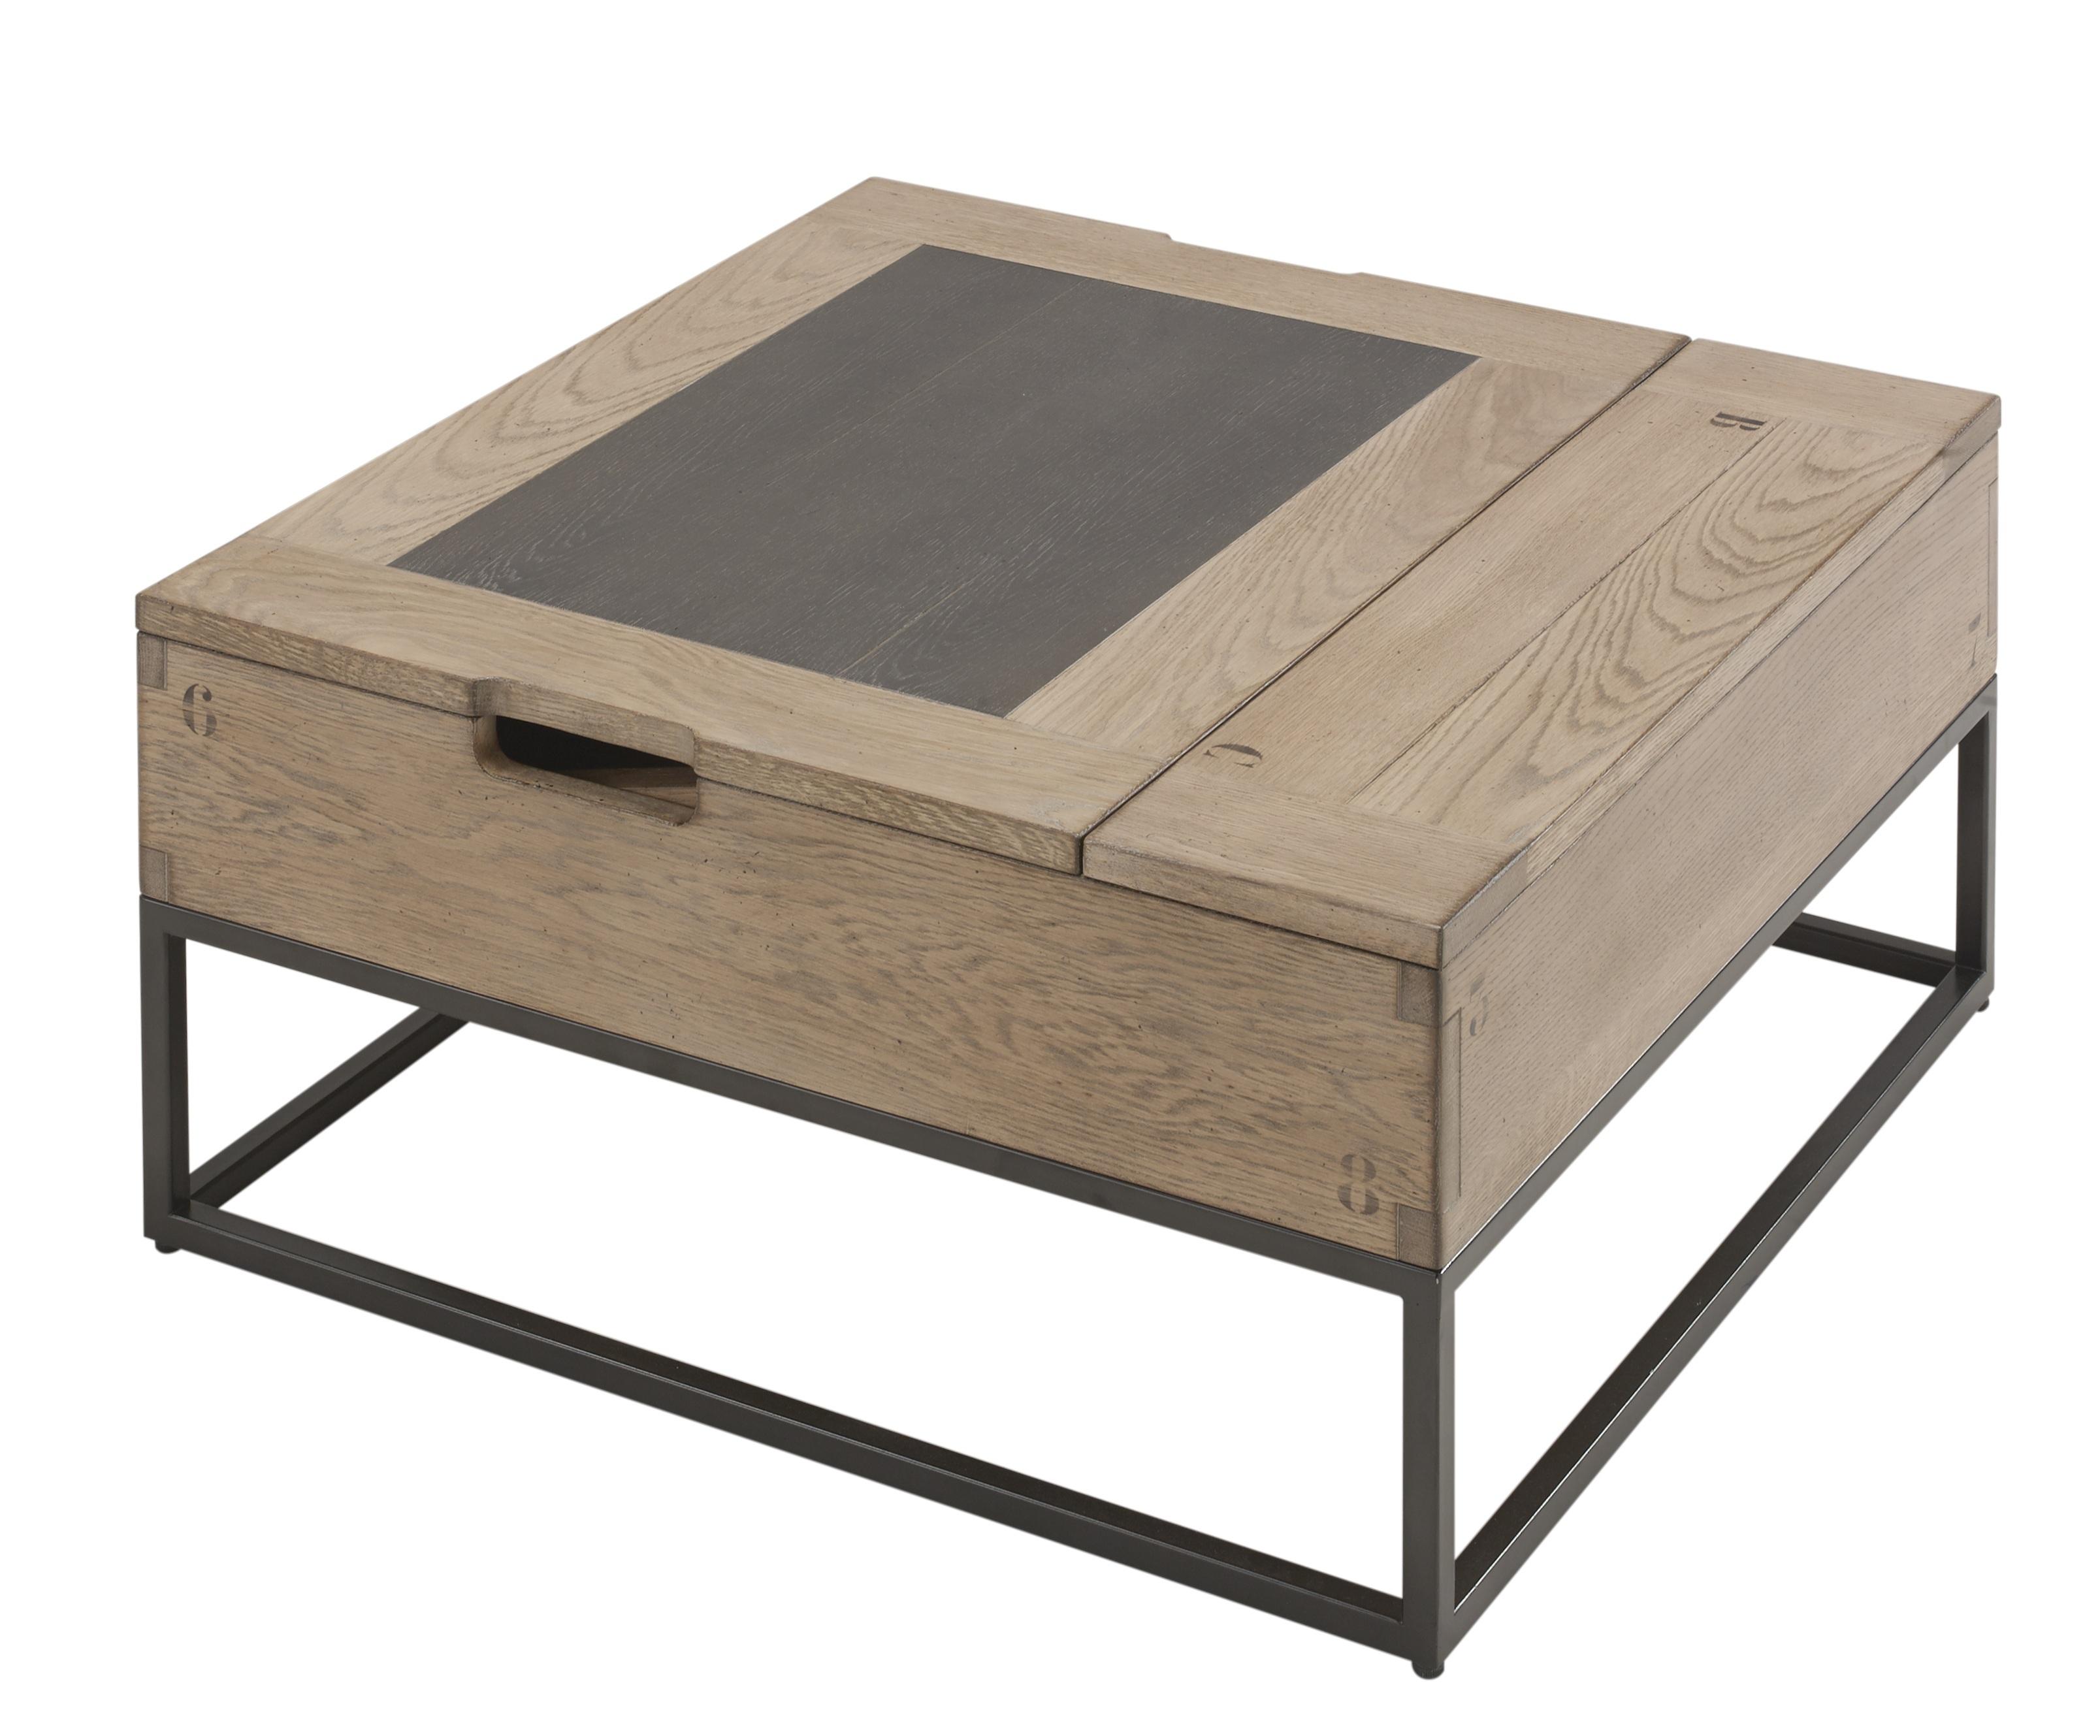 Table basse carrée relevable (Artcopi)